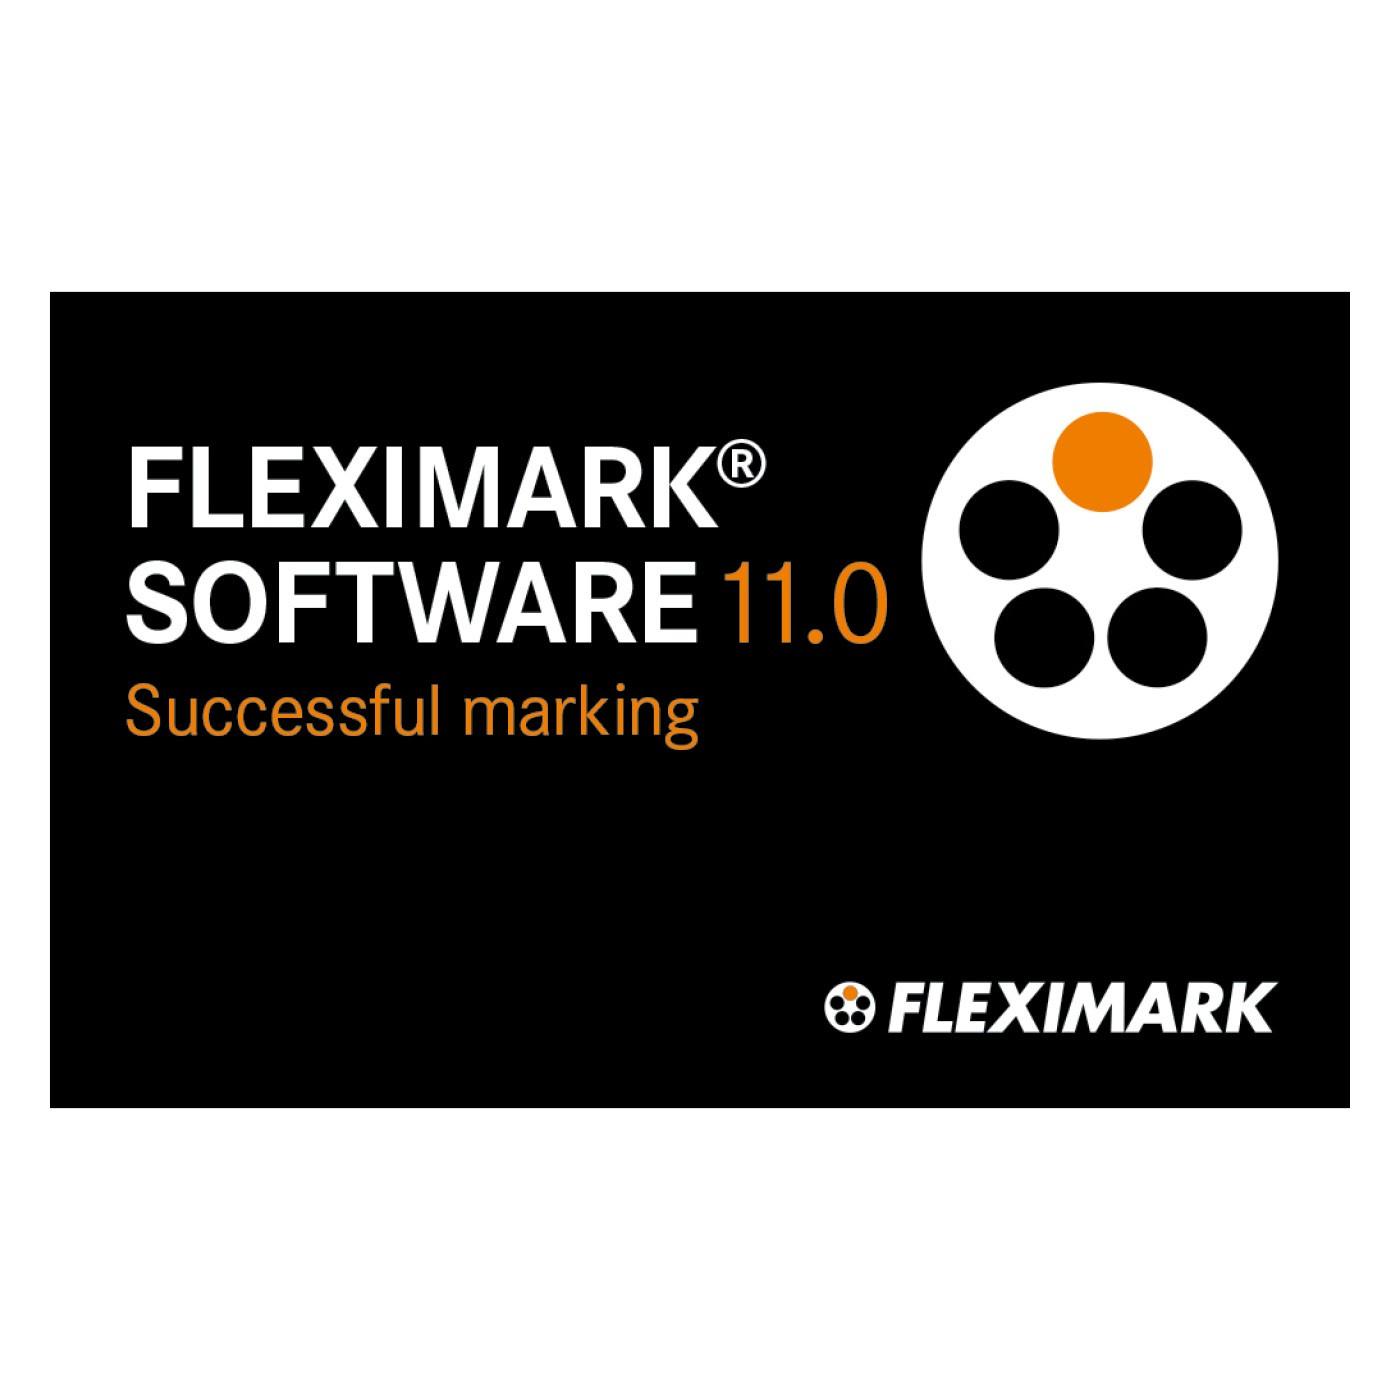 FLEXIMARK® Software 11.0